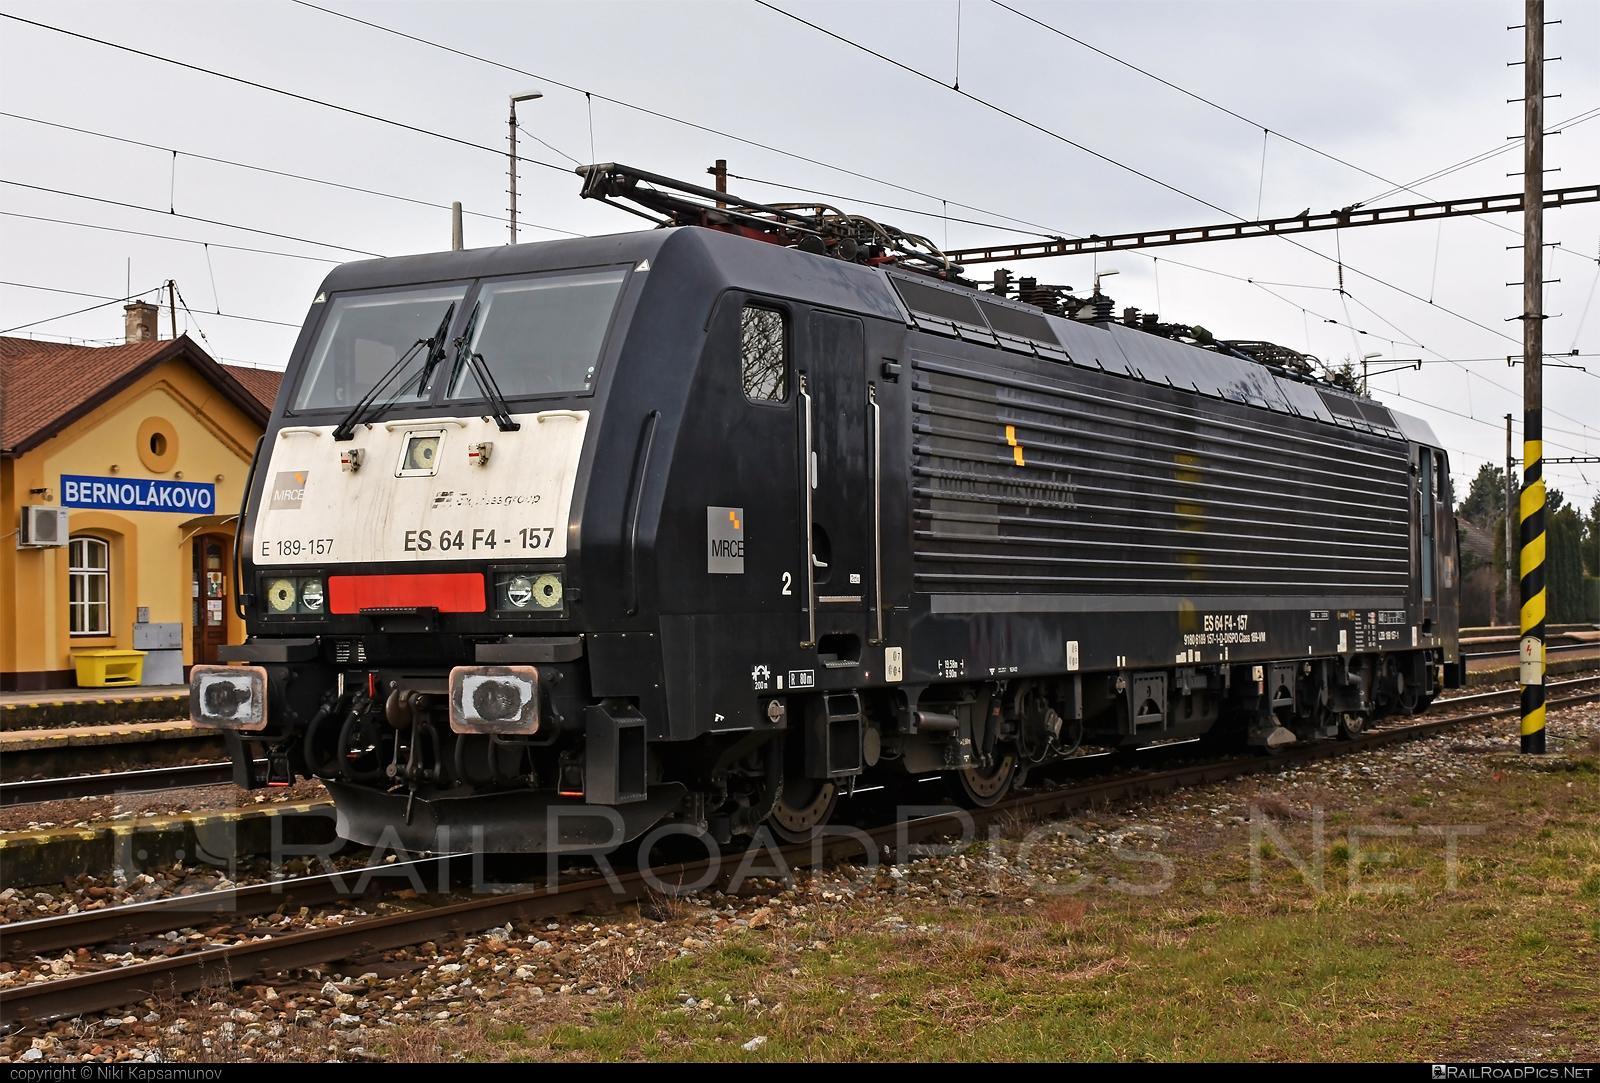 Siemens ES 64 F4 - 189 157-1 operated by Retrack Slovakia s. r. o. #dispolok #es64 #es64f4 #eurosprinter #mitsuirailcapitaleurope #mitsuirailcapitaleuropegmbh #mrce #retrackslovakia #siemens #siemenses64 #siemenses64f4